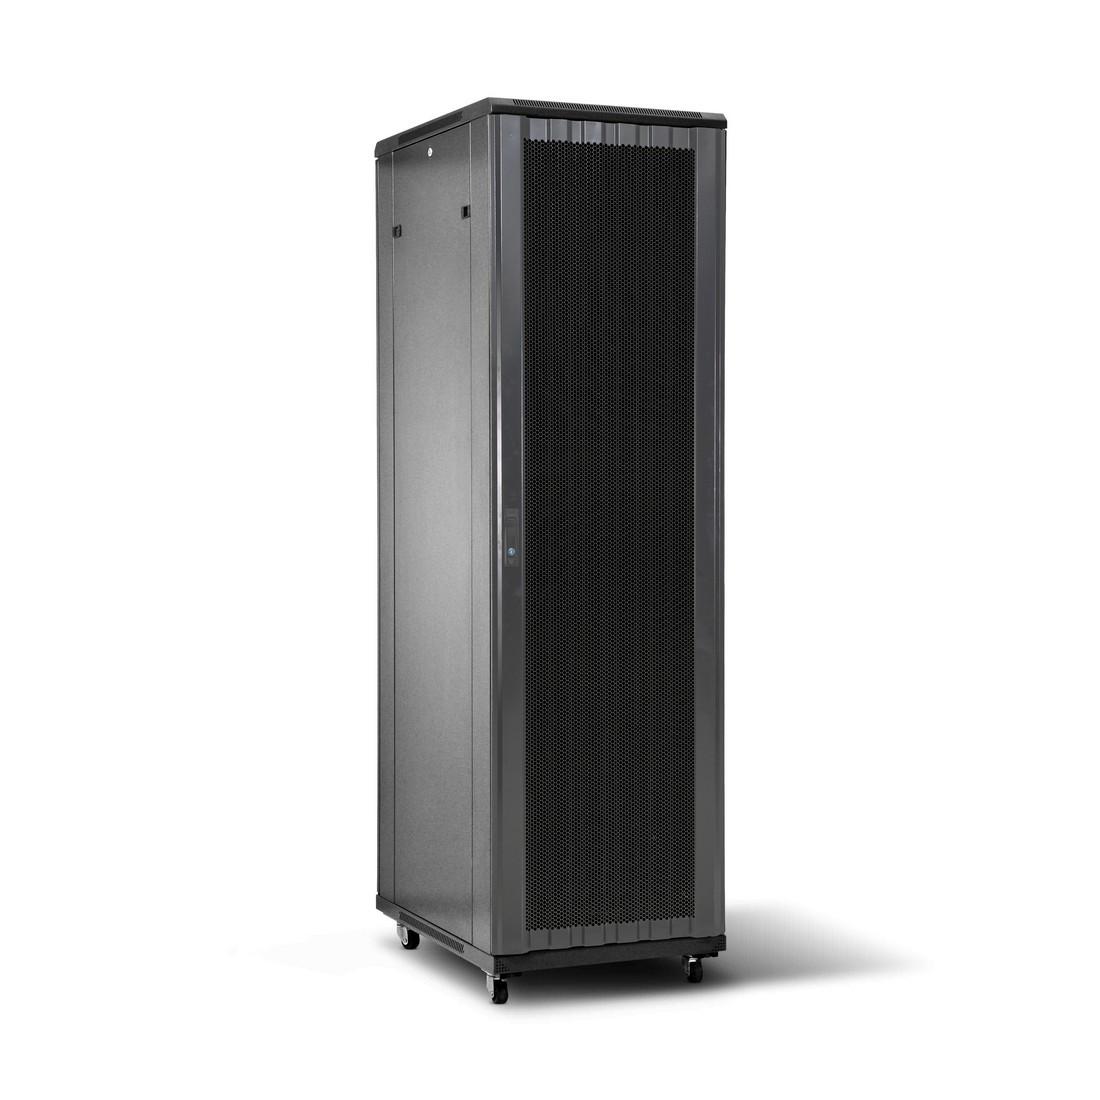 Шкаф серверный SHIP 601S.8042.54.100 42U 800*1000*2000 мм